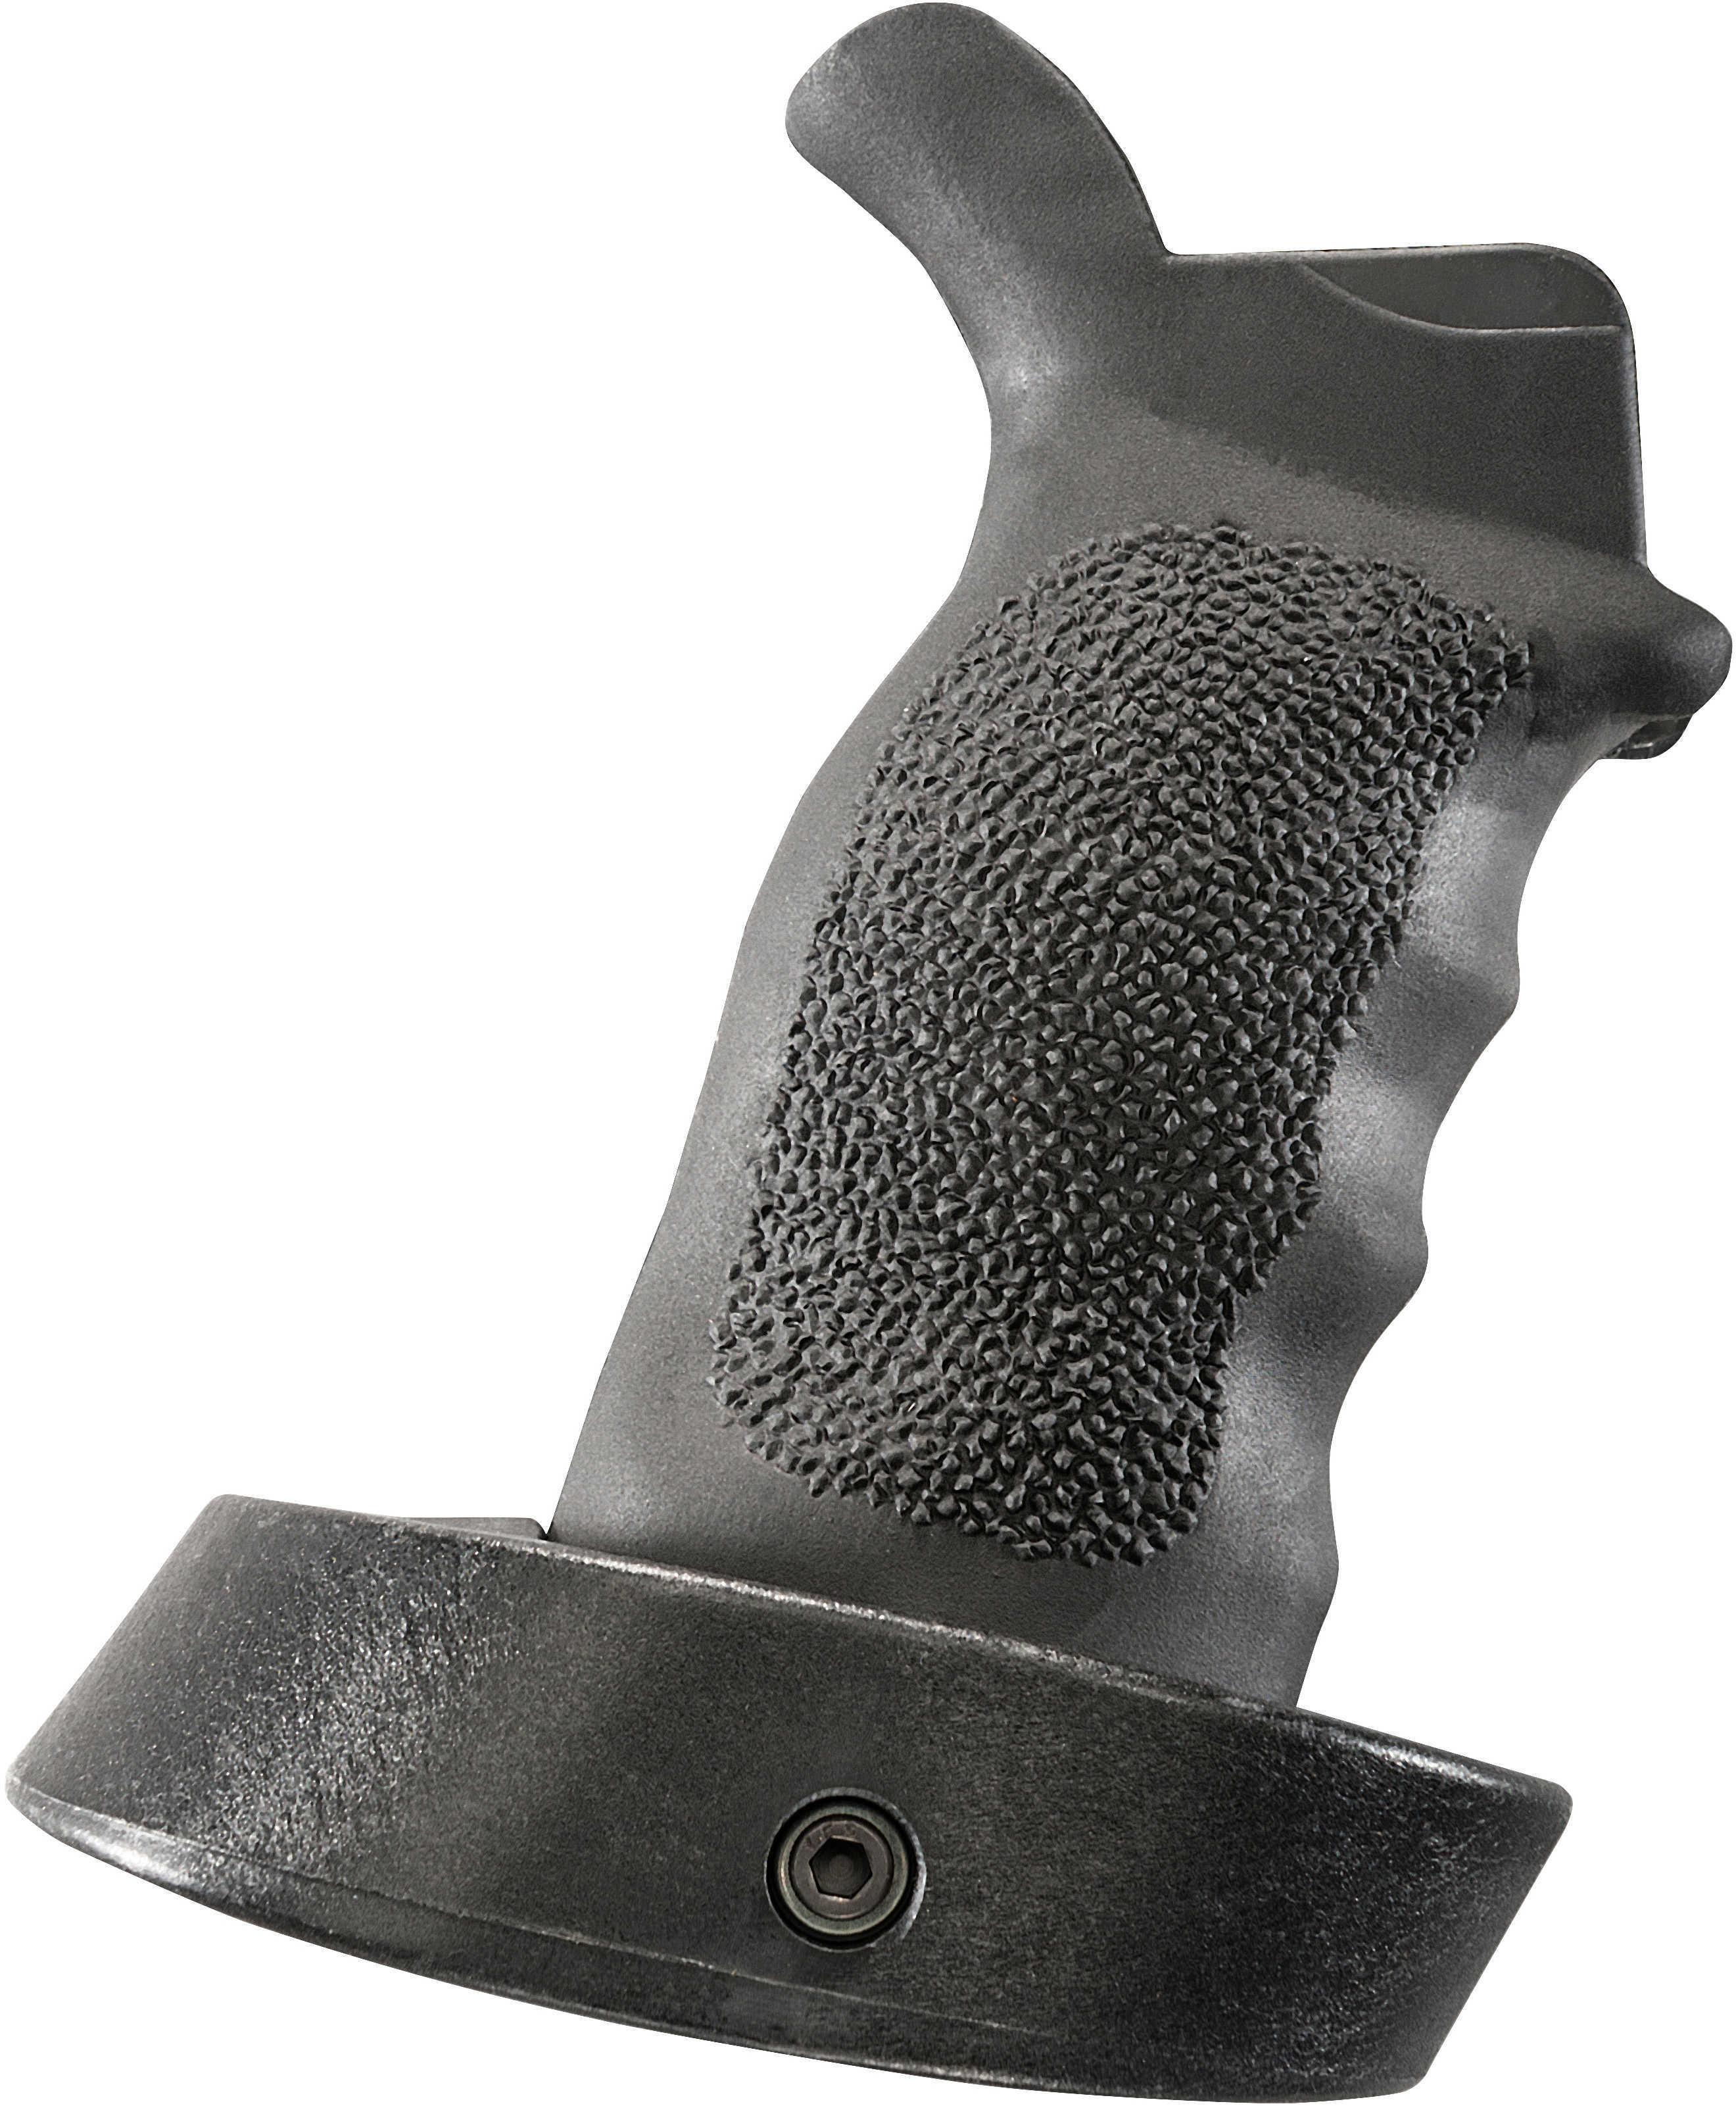 Ergo Grip Tactical Deluxe W/ Palm Shelf SUREGRIP AR15 Black